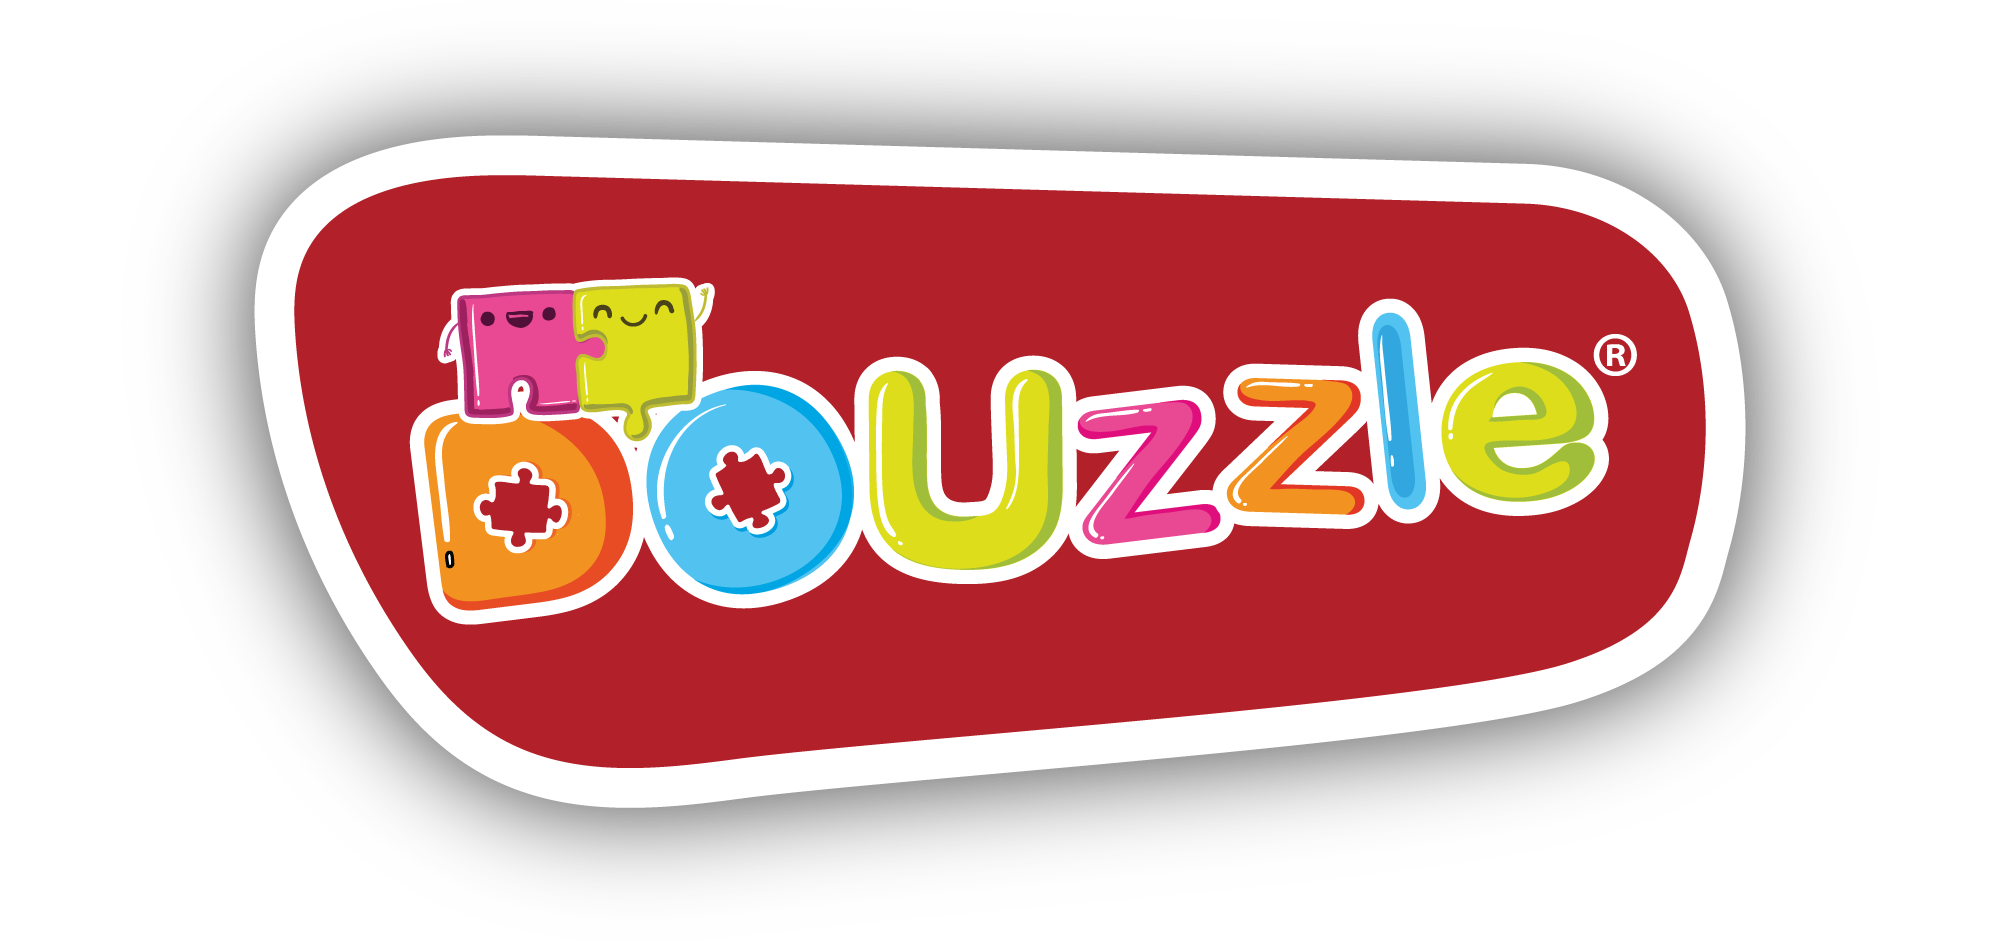 Douzzle-logo - shade.png